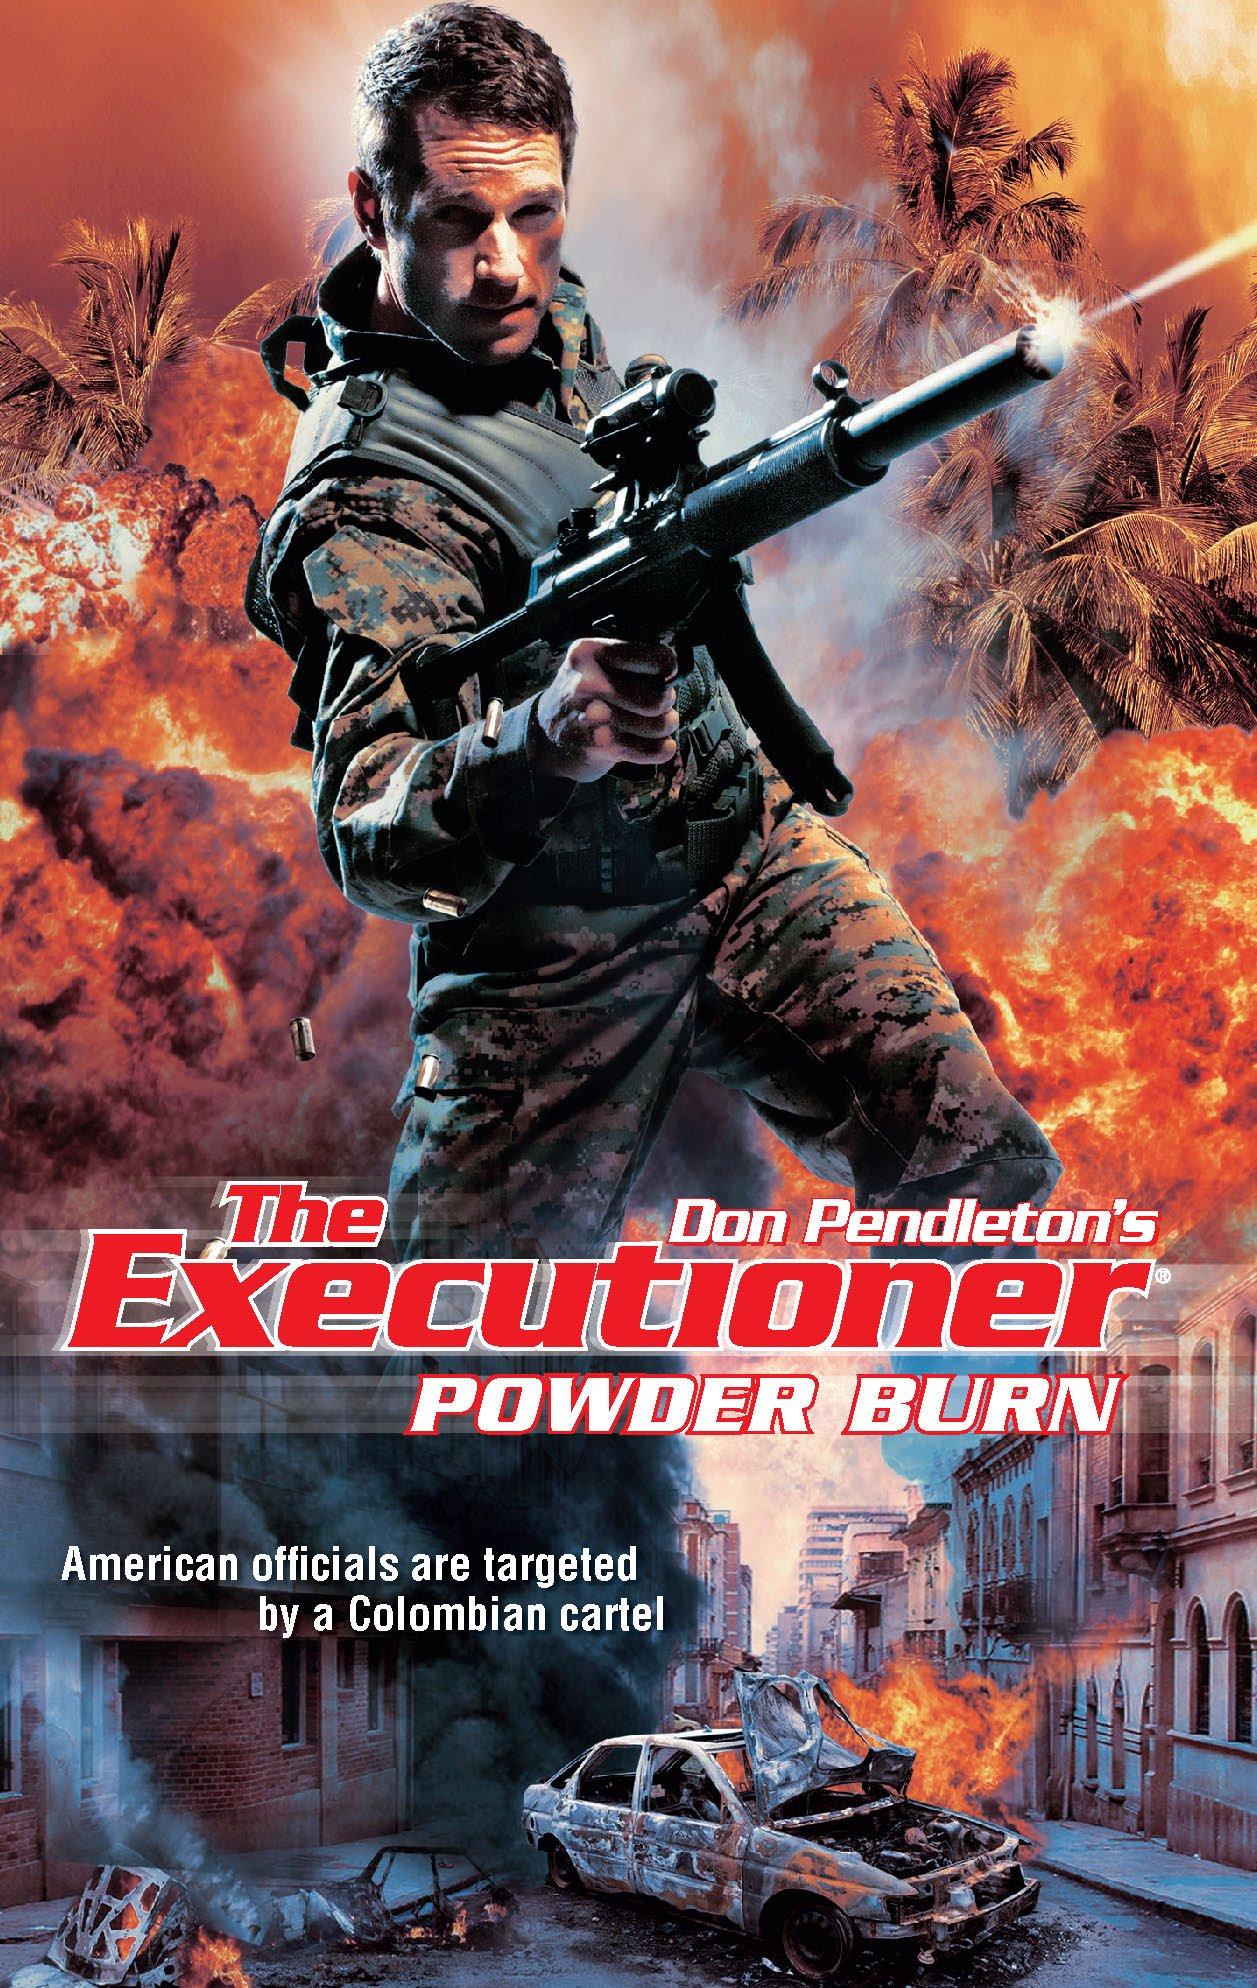 Amazon.com: Powder Burn (The Executioner #387) (9780373643875): Don  Pendleton: Books